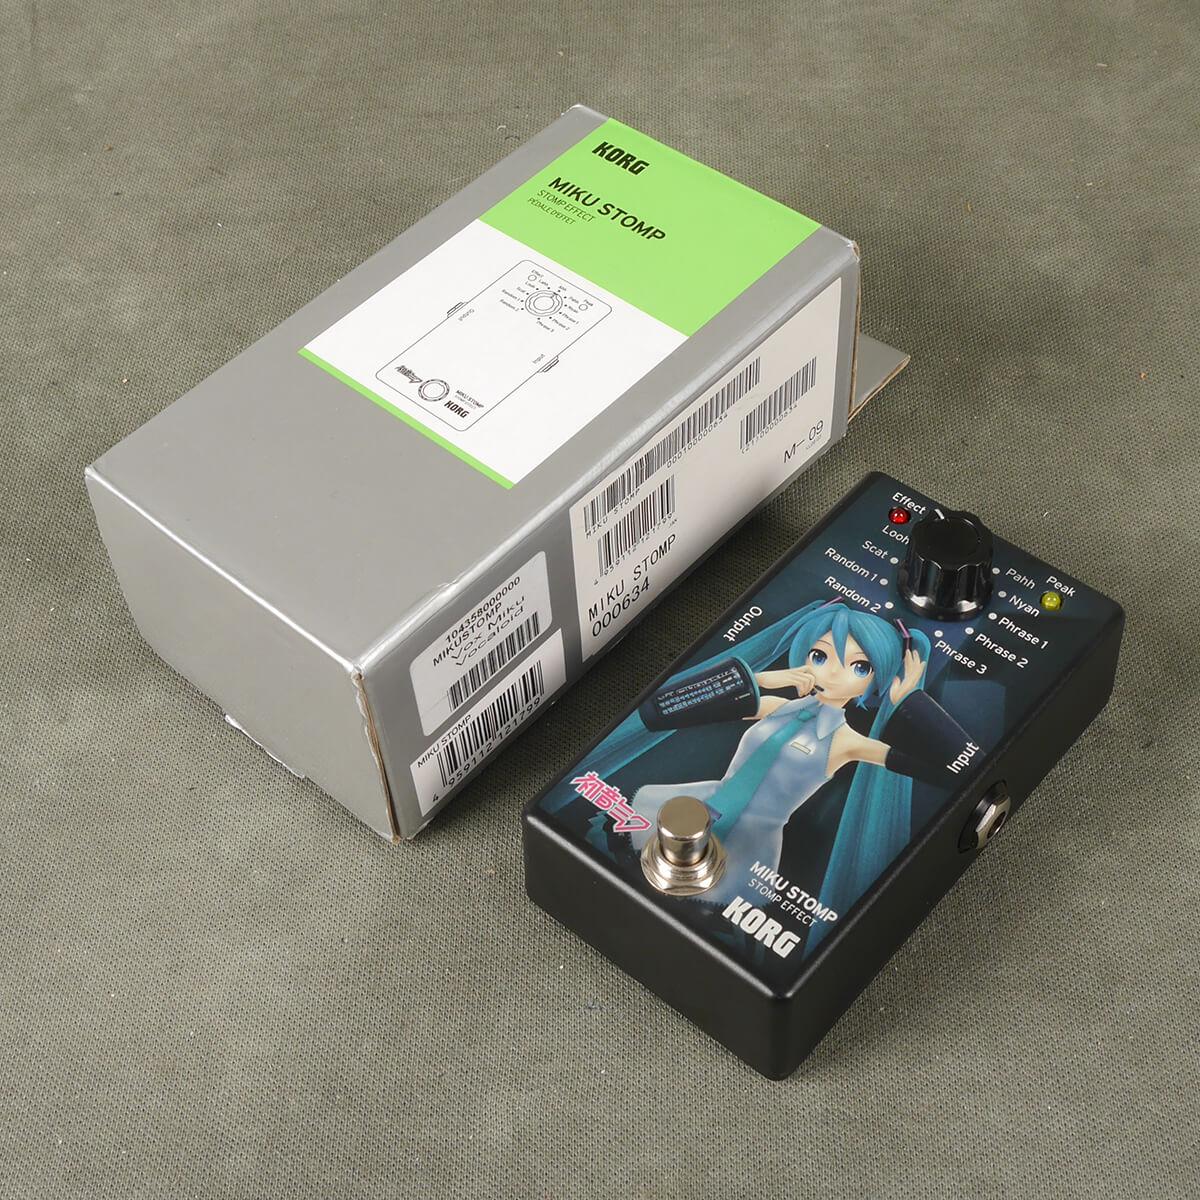 Korg Miku Stomp FX Pedal w/Box - 2nd Hand